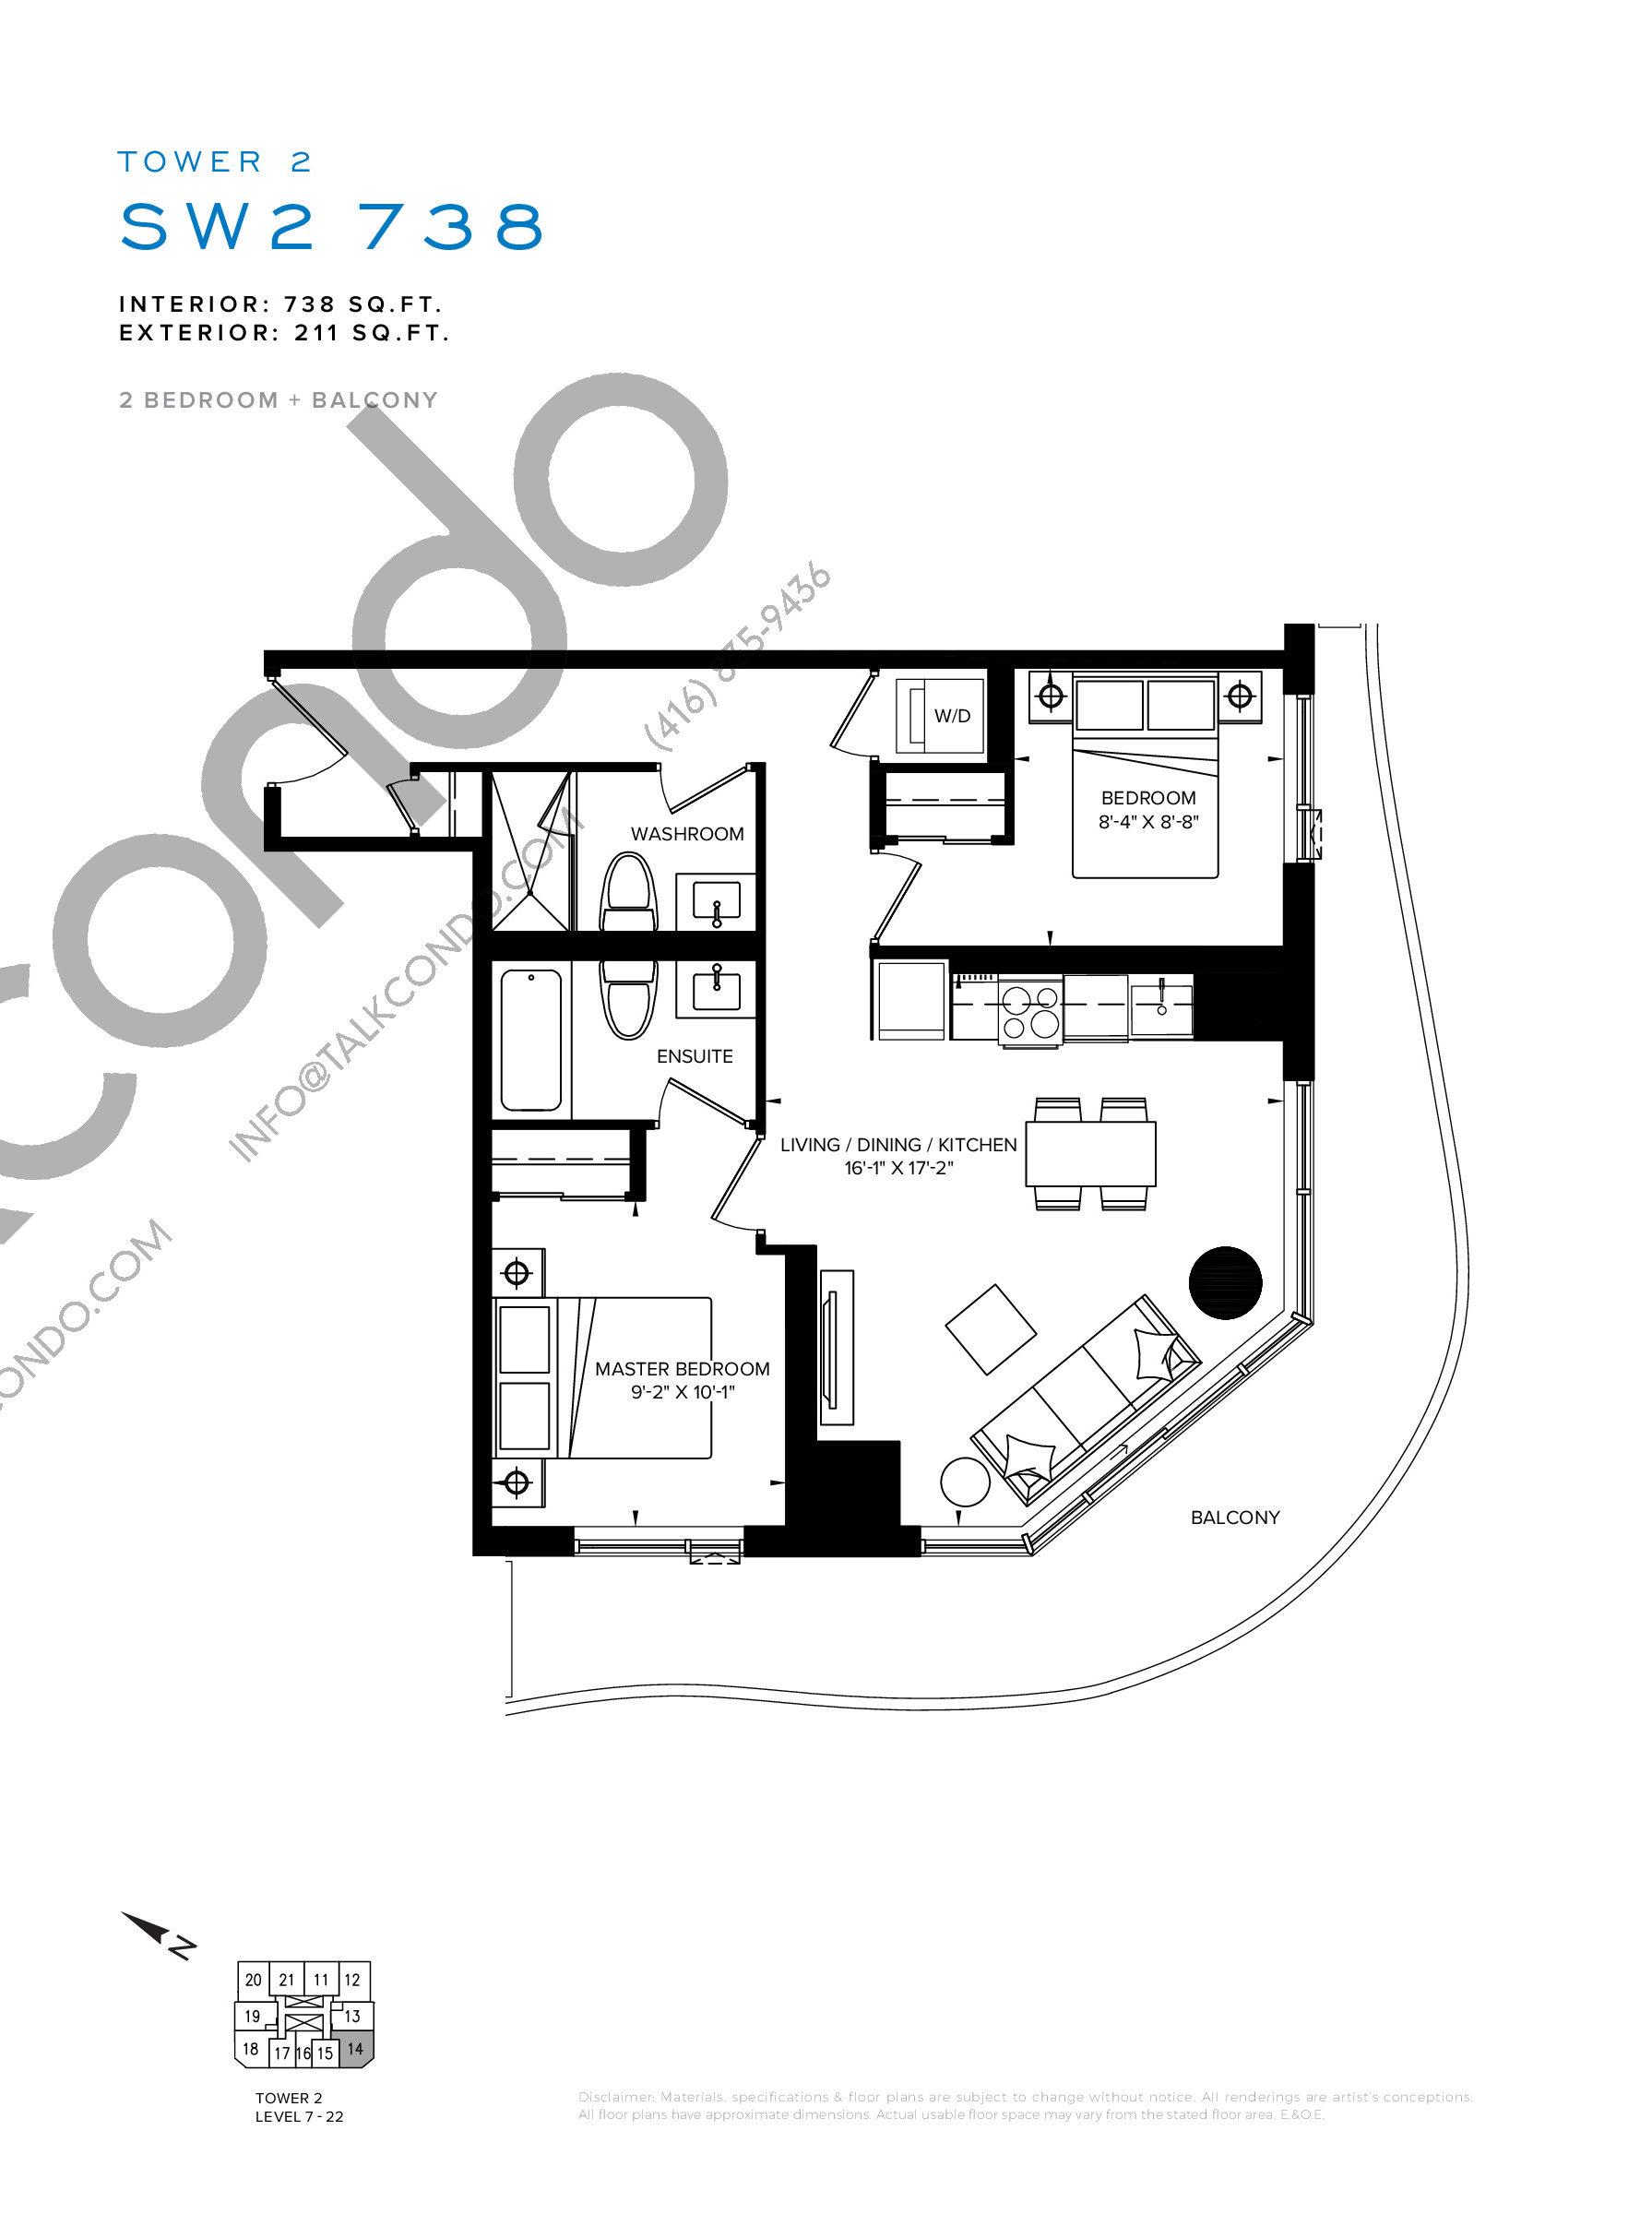 SW2 738 Floor Plan at SXSW Tower 2 Condos (SXSW2) - 738 sq.ft